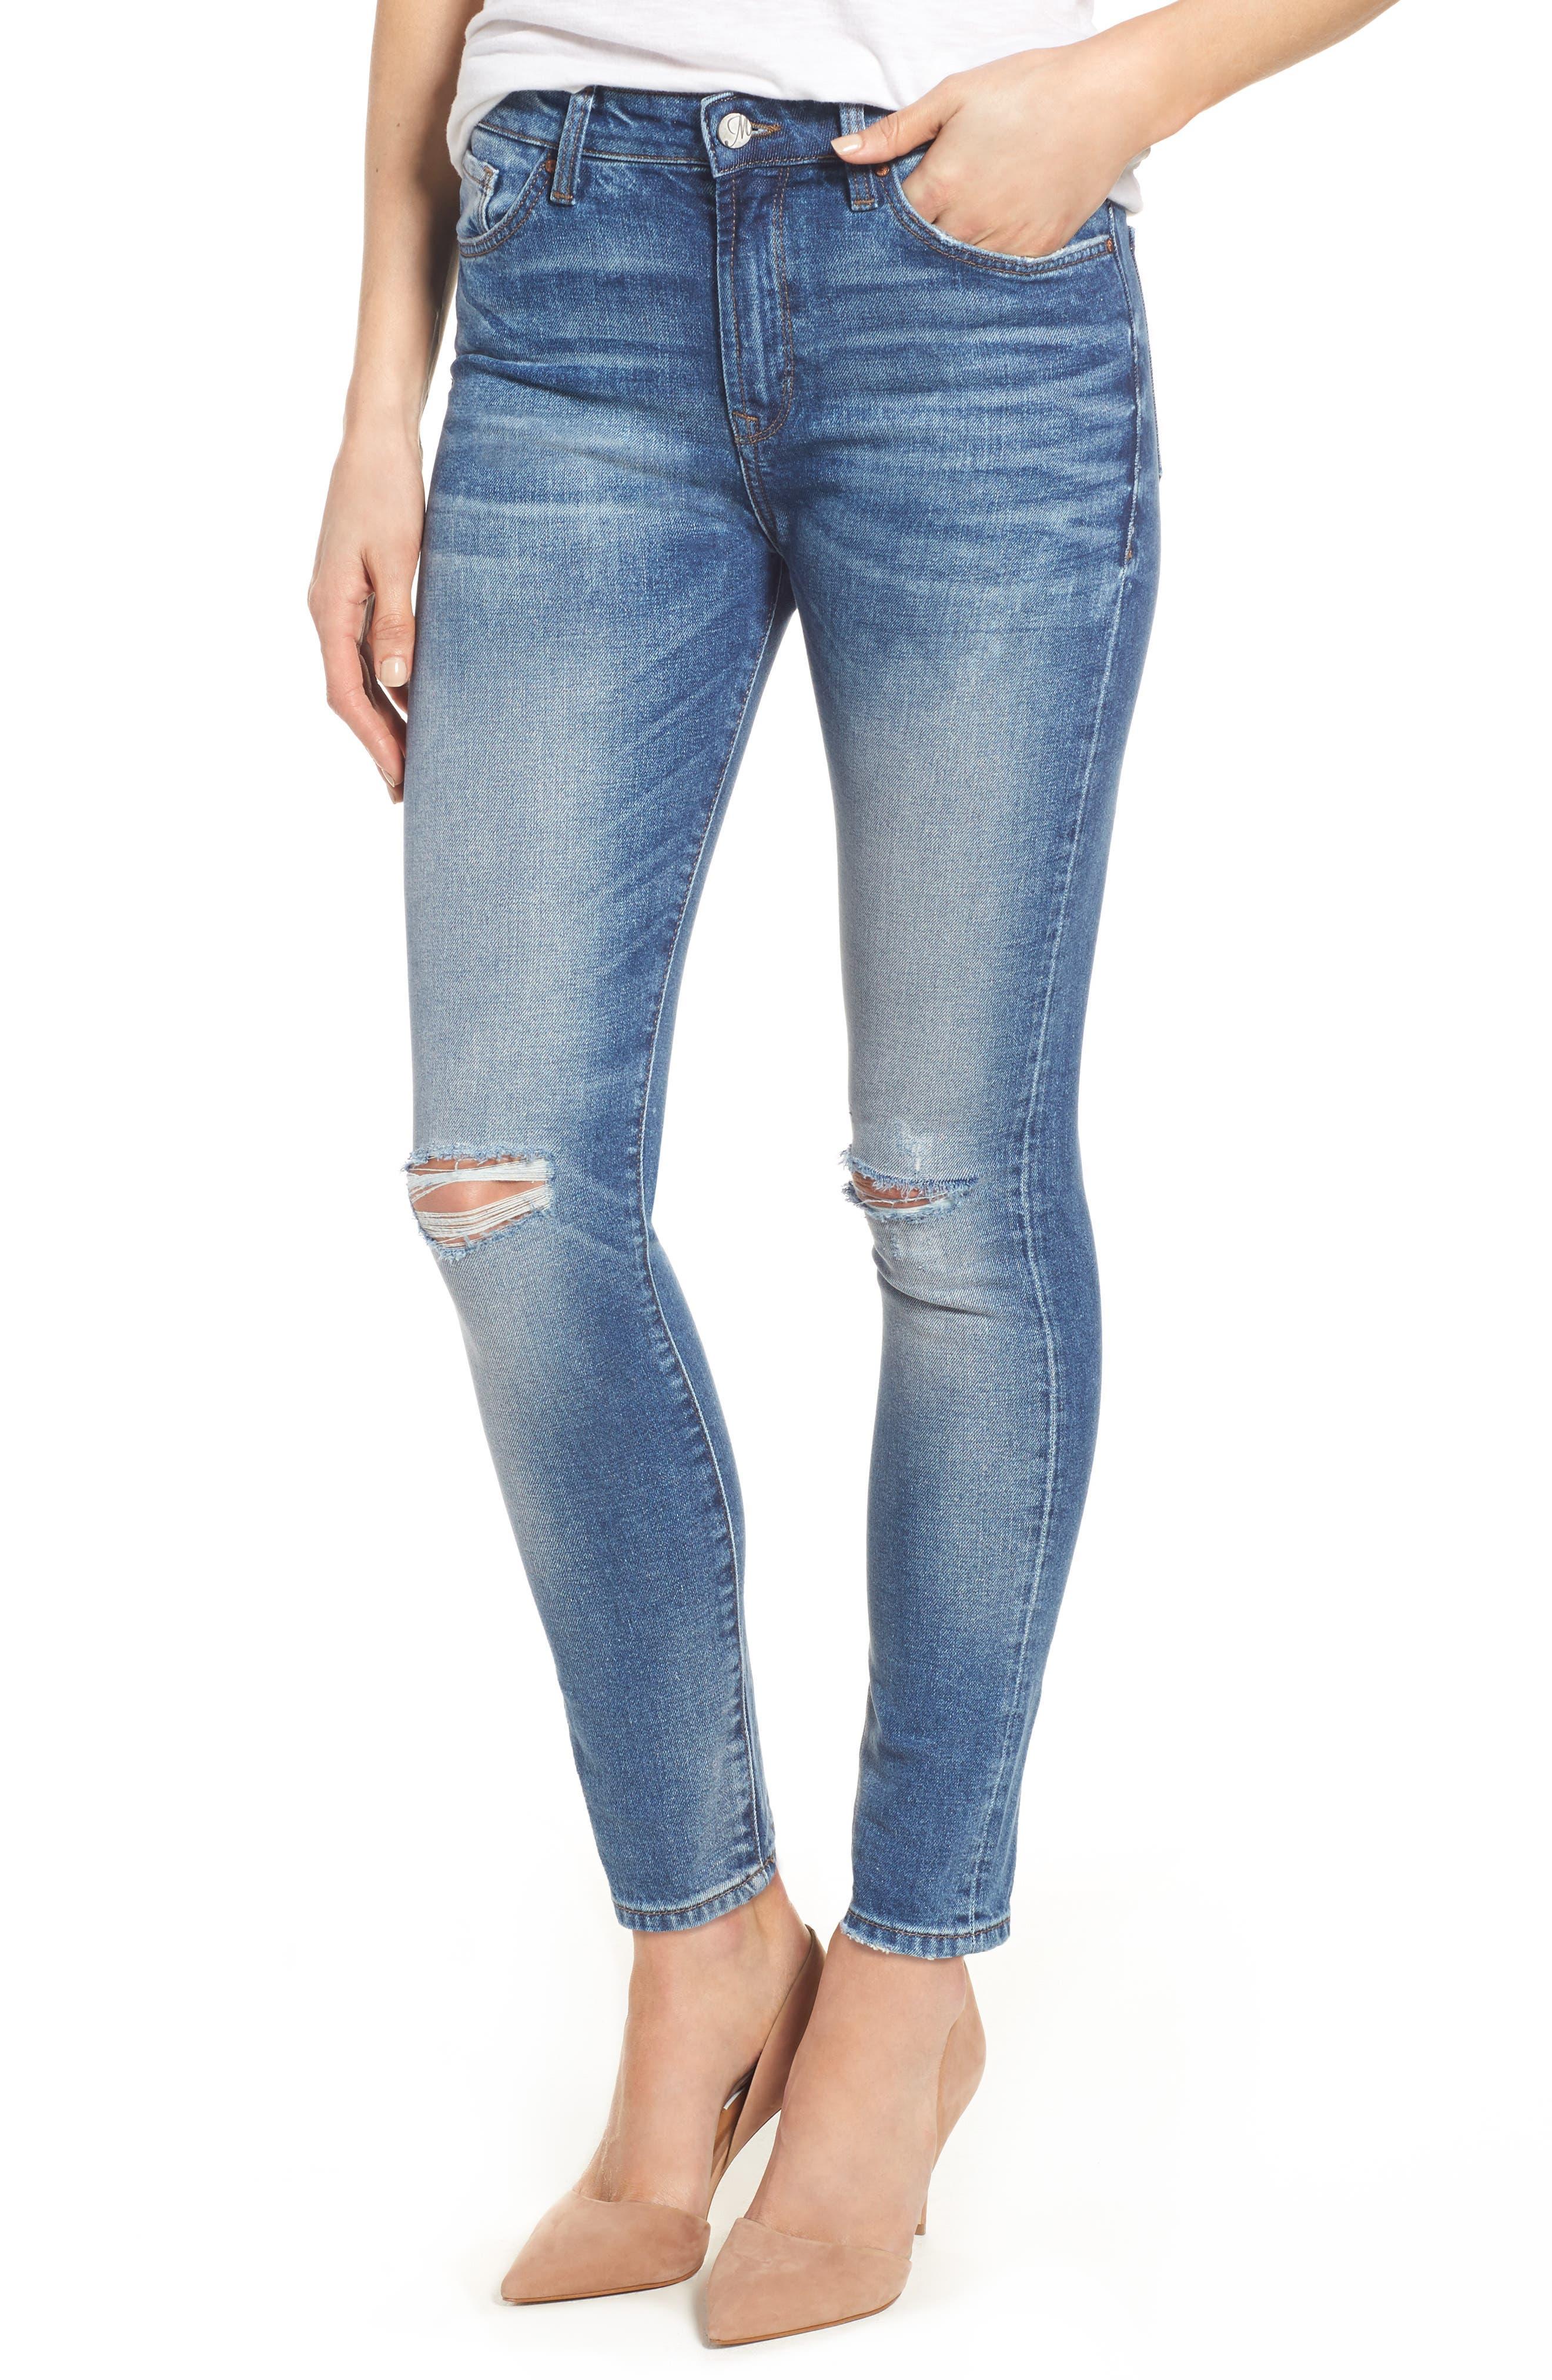 Main Image - Mavi Jeans Lucy Ripped Skinny Jeans (Foggy)